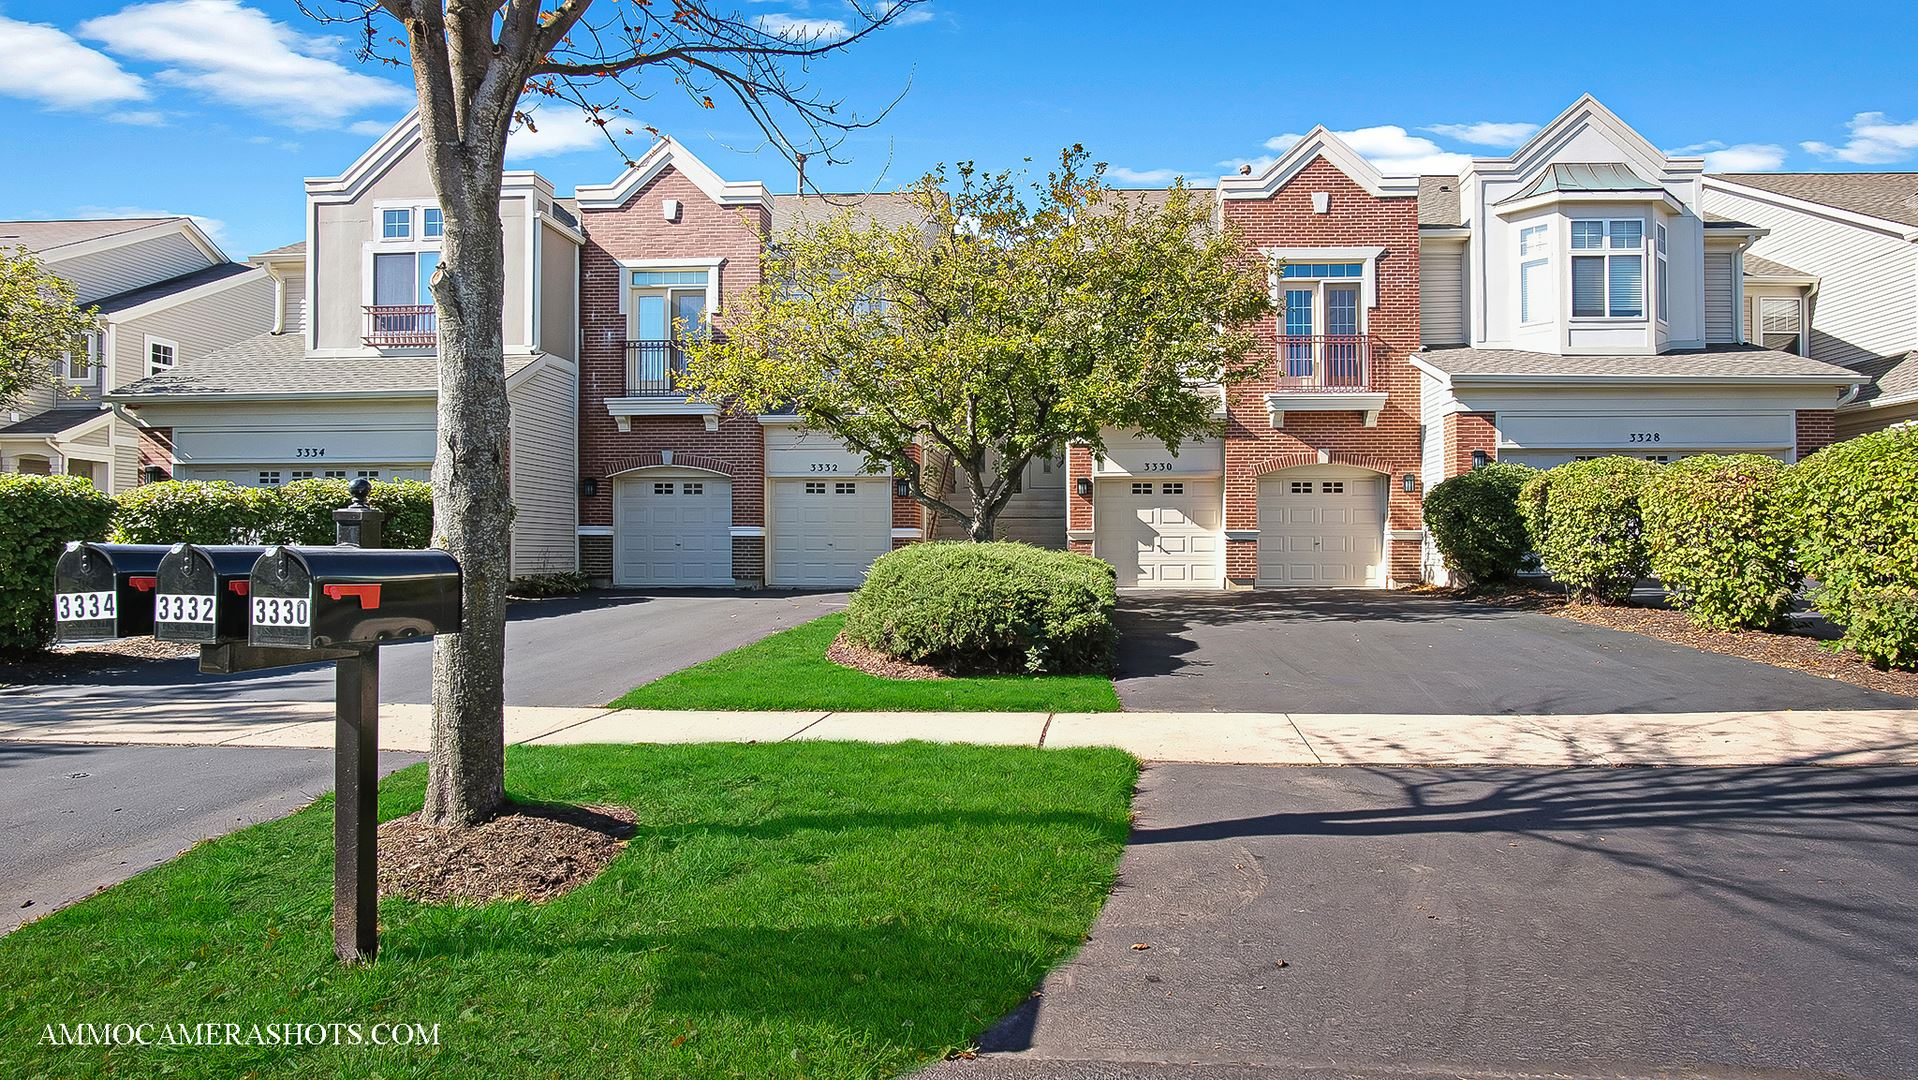 Photo of 3330 Rosecroft Lane, Naperville, IL 60564 (MLS # 11254842)